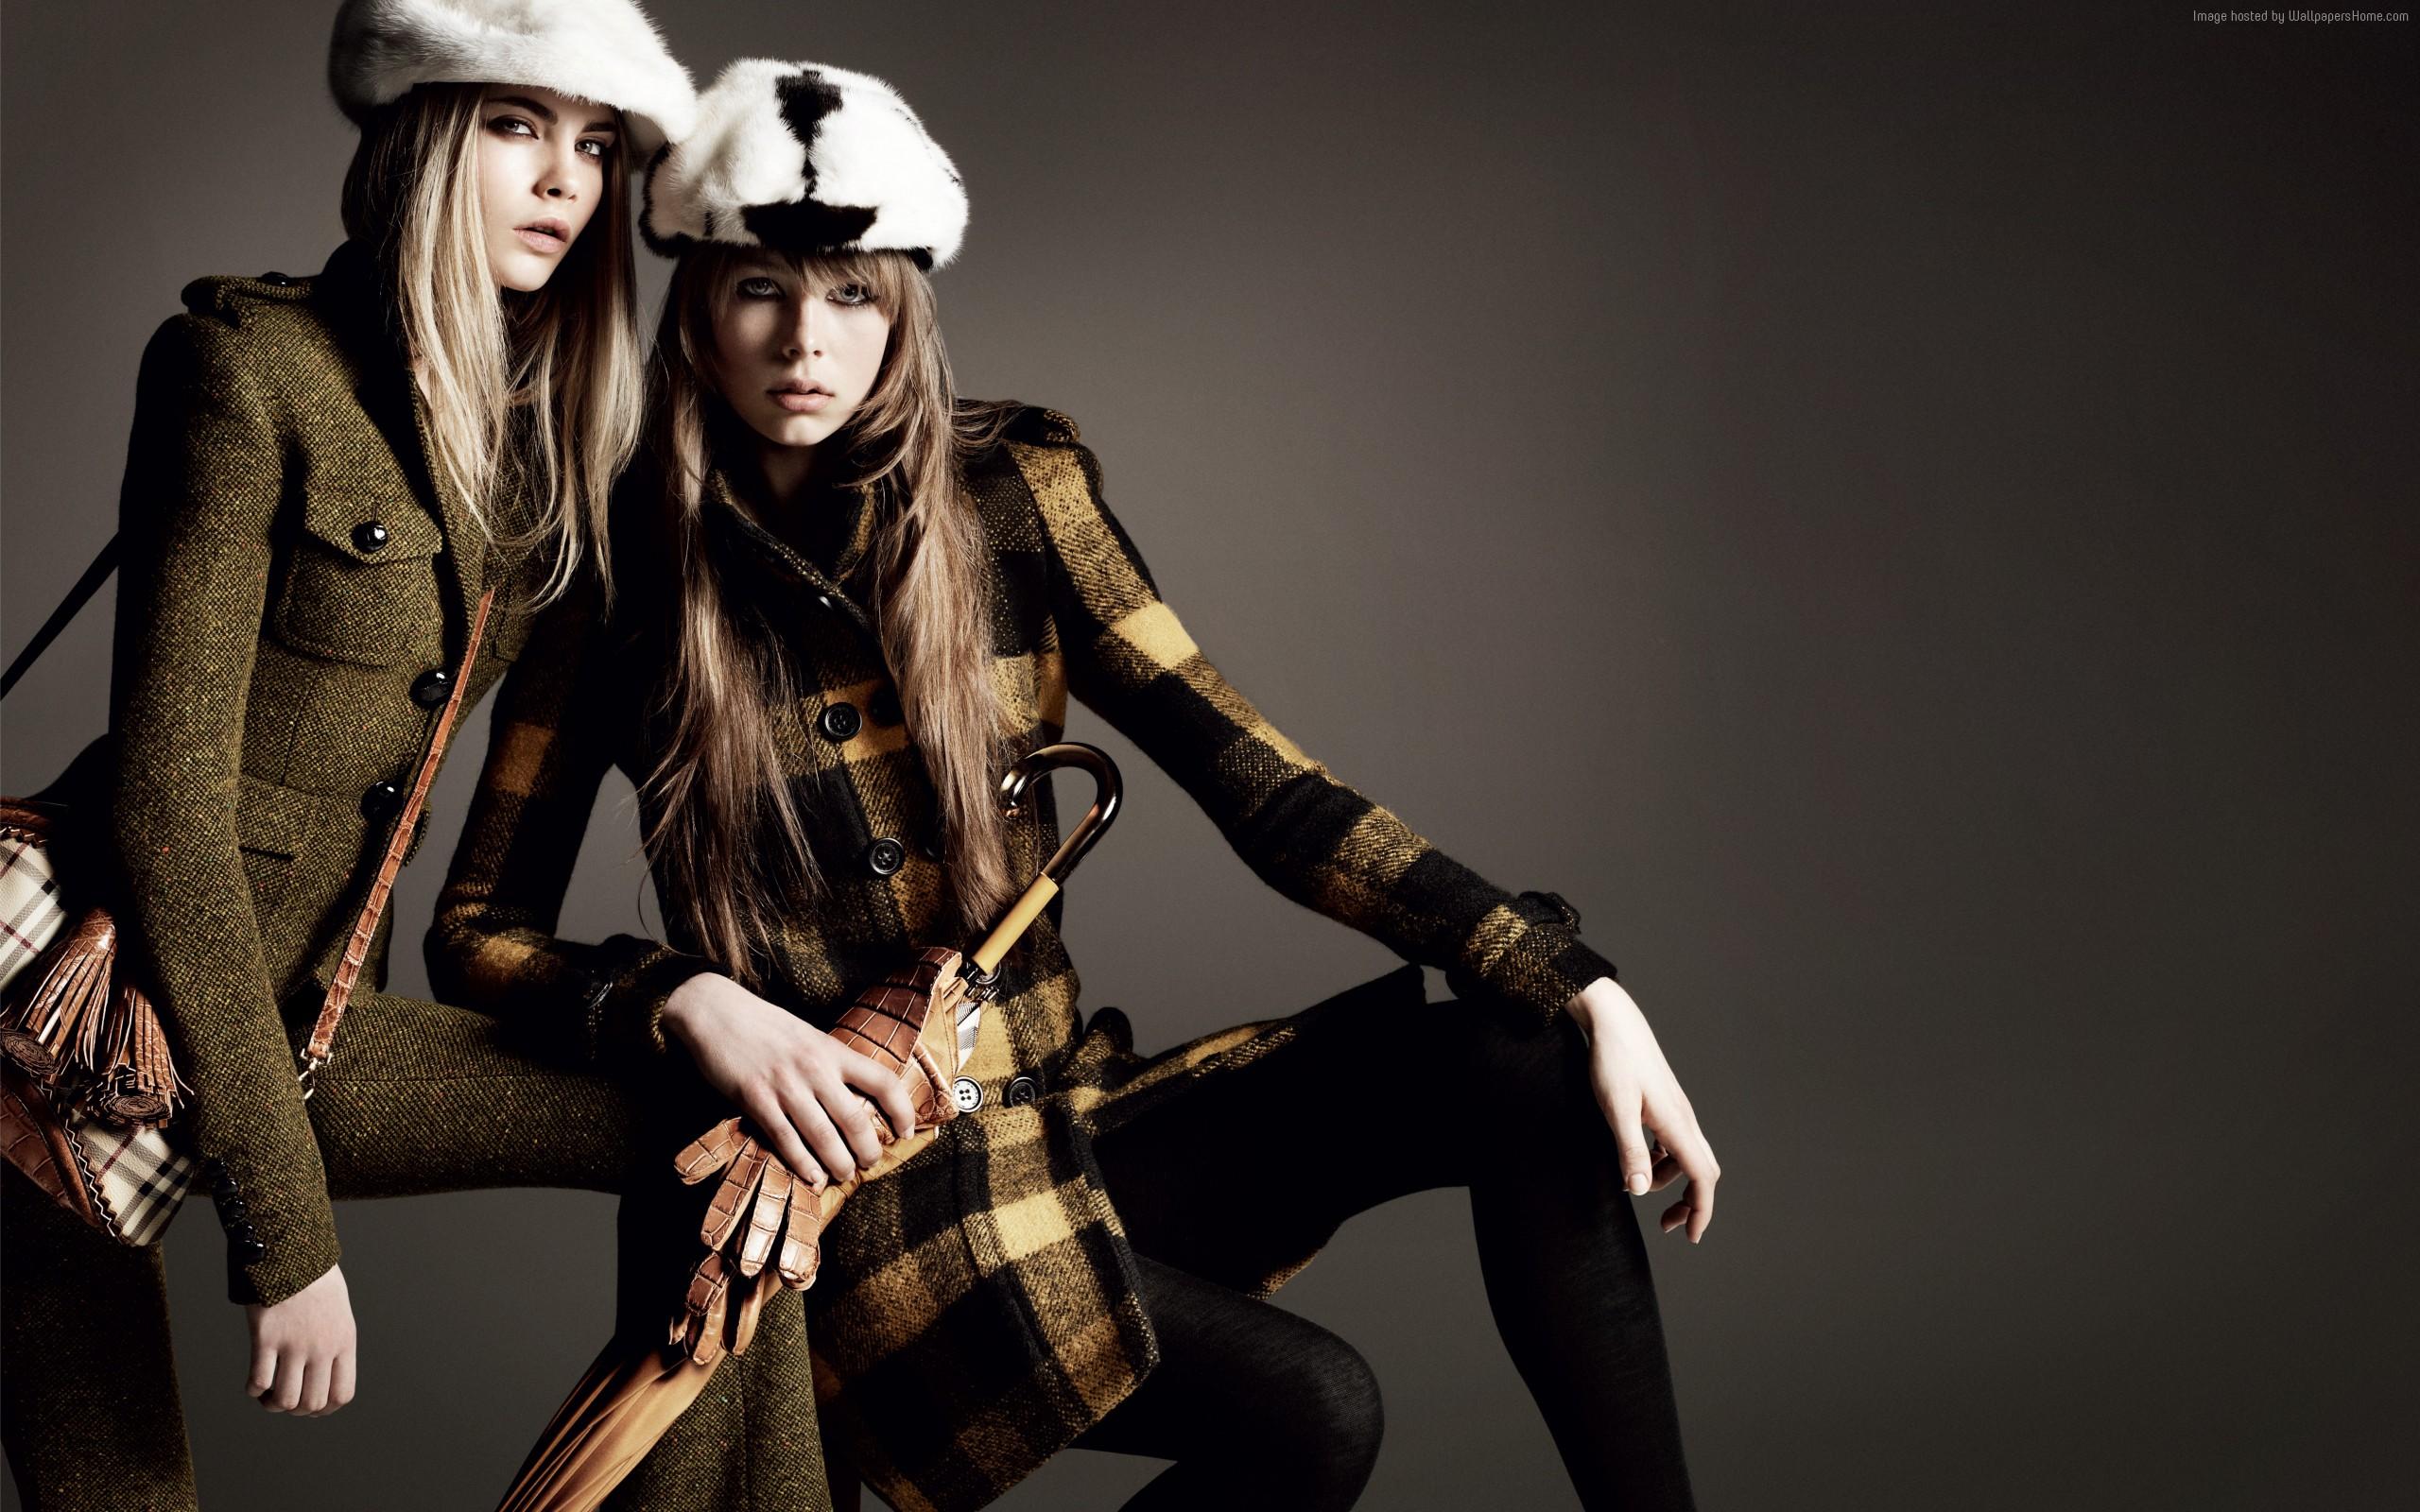 Cara Delevingne Fashion, HD Celebrities, 4k Wallpapers